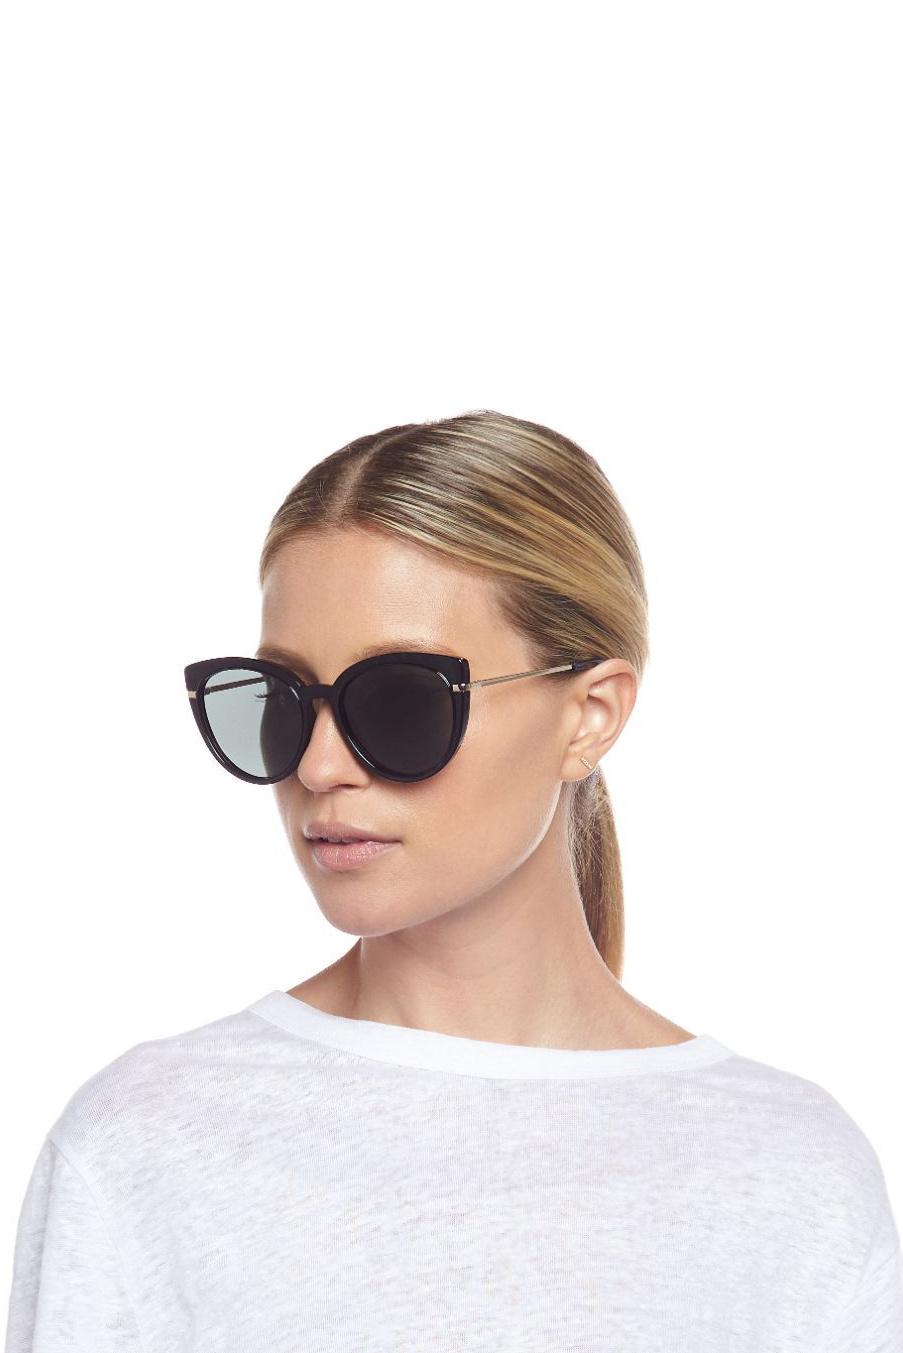 Promiscuous *Polarized* Sunglasses - Black-4